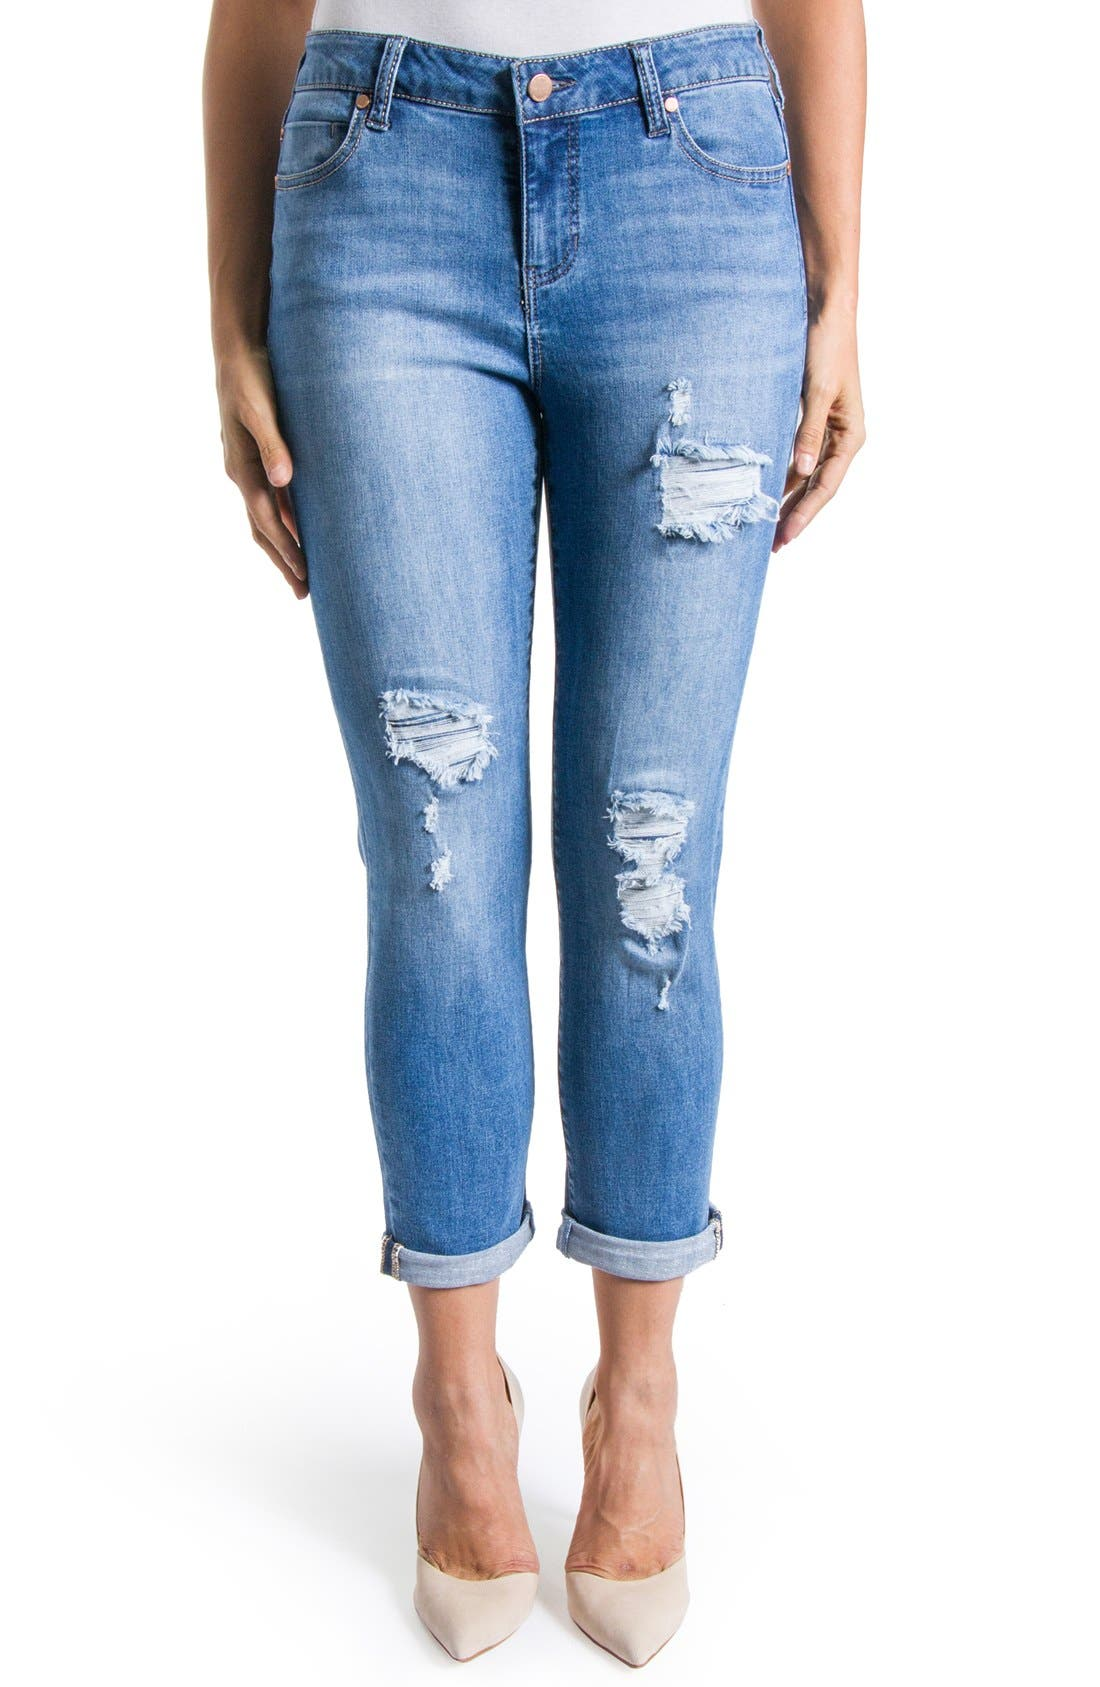 Alternate Image 1 Selected - Liverpool Jeans Company 'Corey' Distressed Crop Boyfriend Jeans (Melbourne)